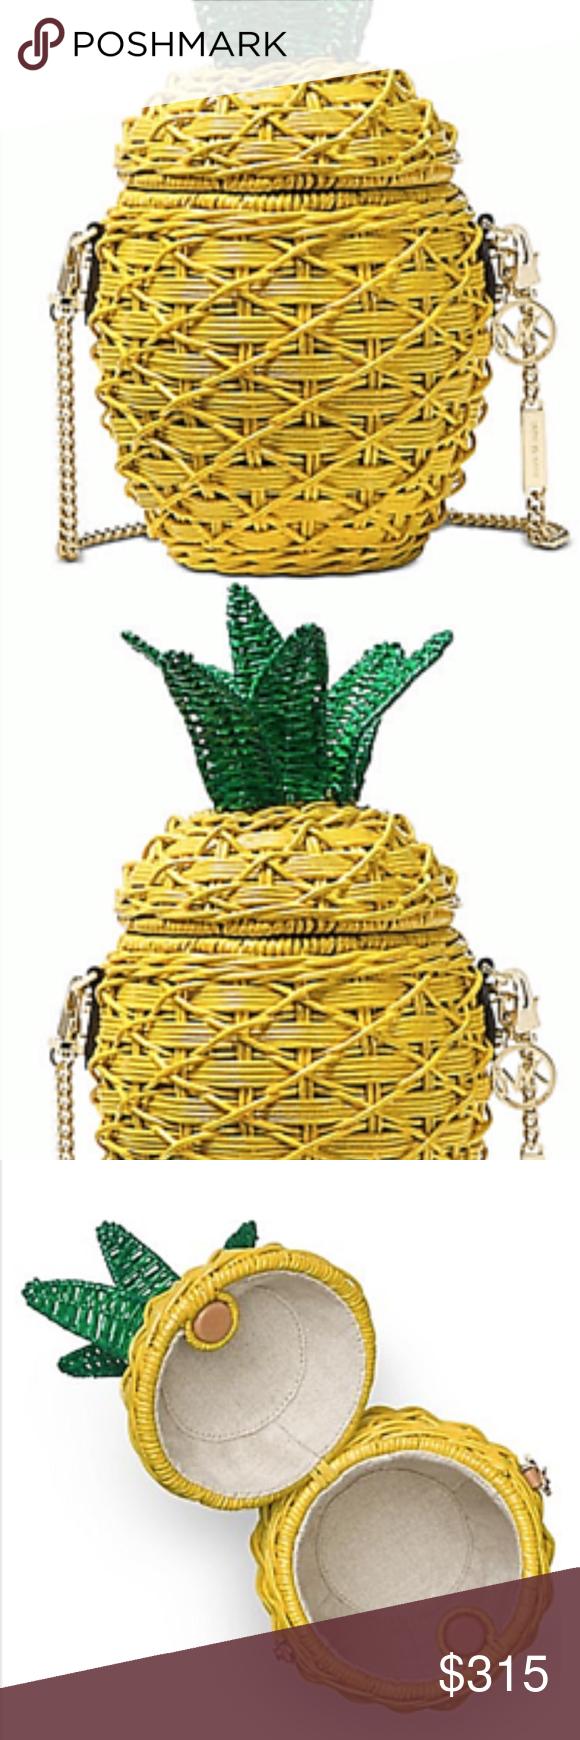 26a0737447fe Michael Kors Straw Pineapple Crossbody Sunflower Michael Kors Straw  Pineapple Crossbody Sunflower A splash of color